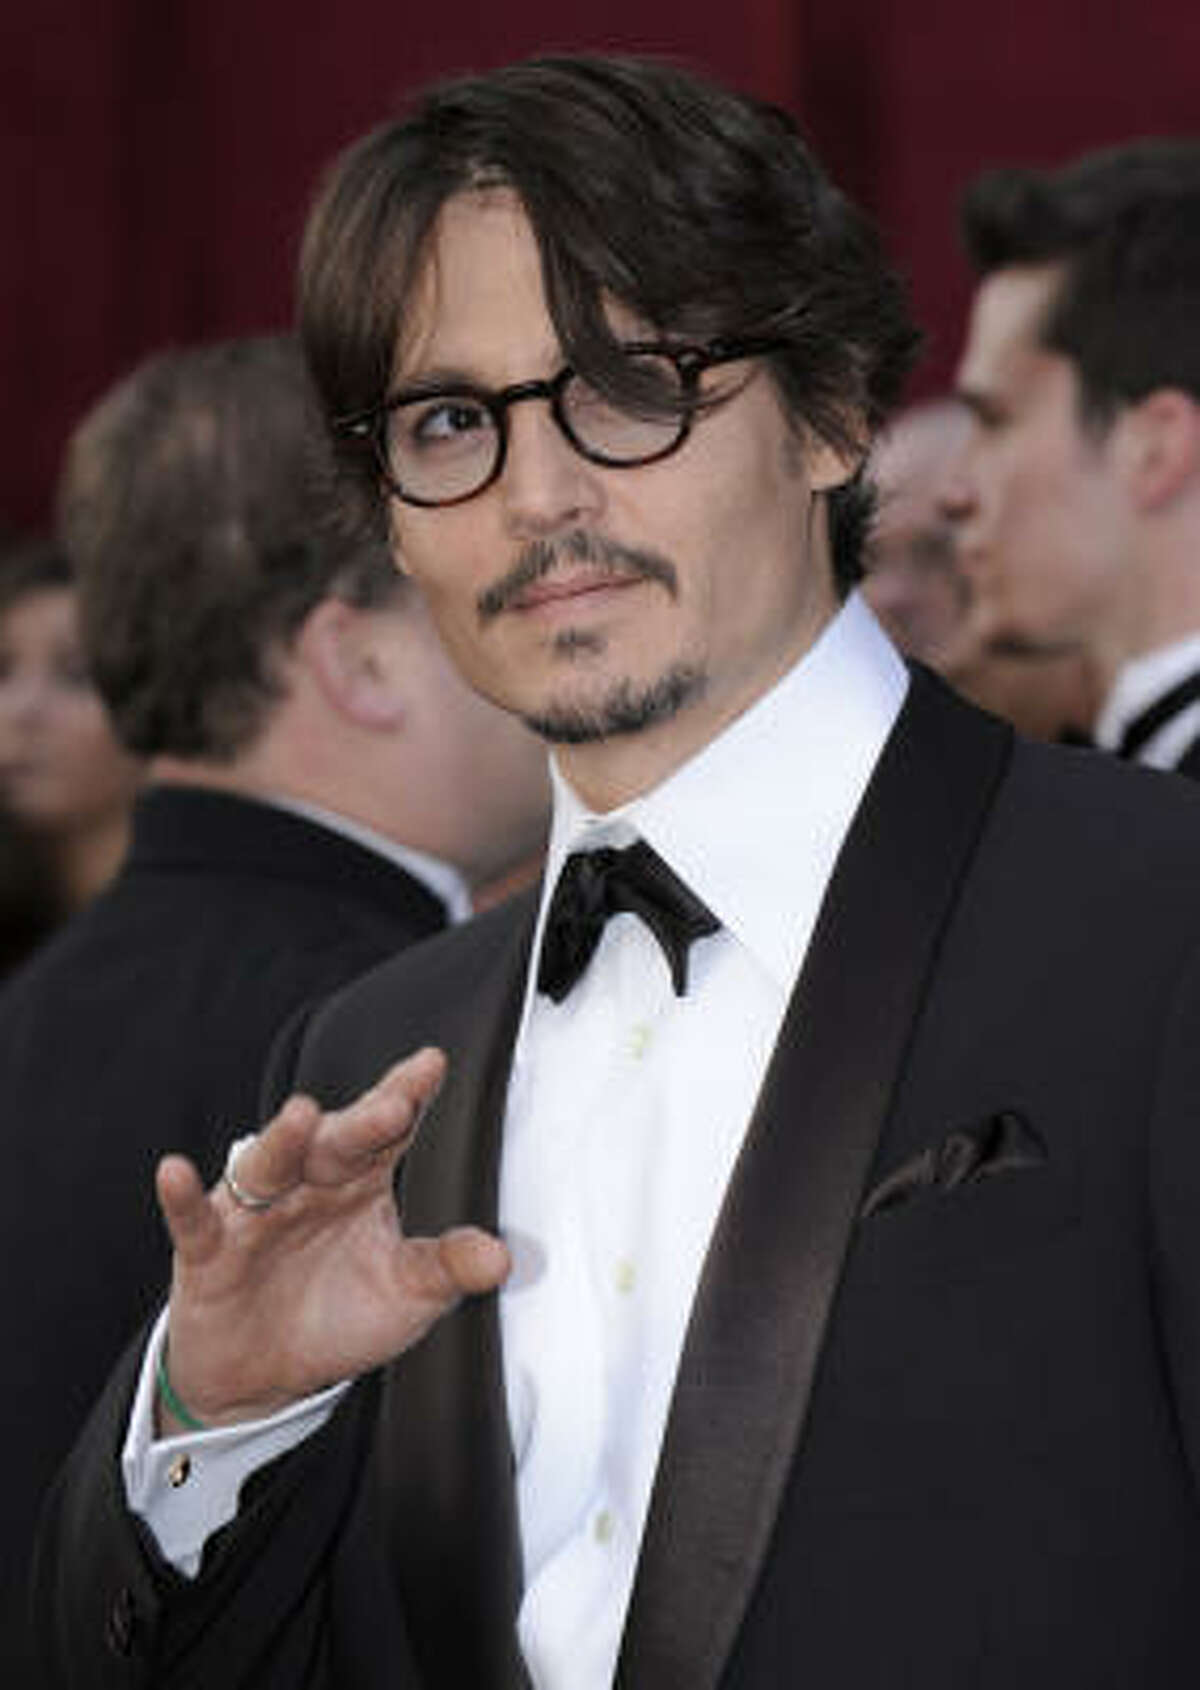 2. Johnny Depp scored a 9.89.